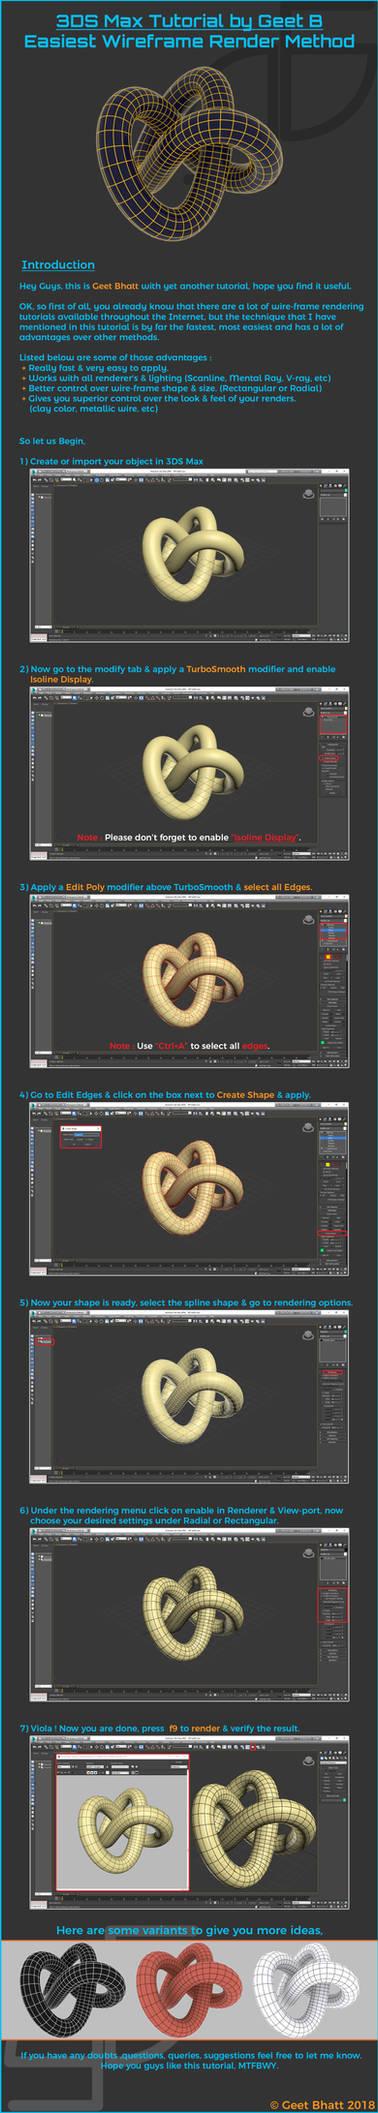 Best wireframe rendering in 3DS Max by GeetBhatt